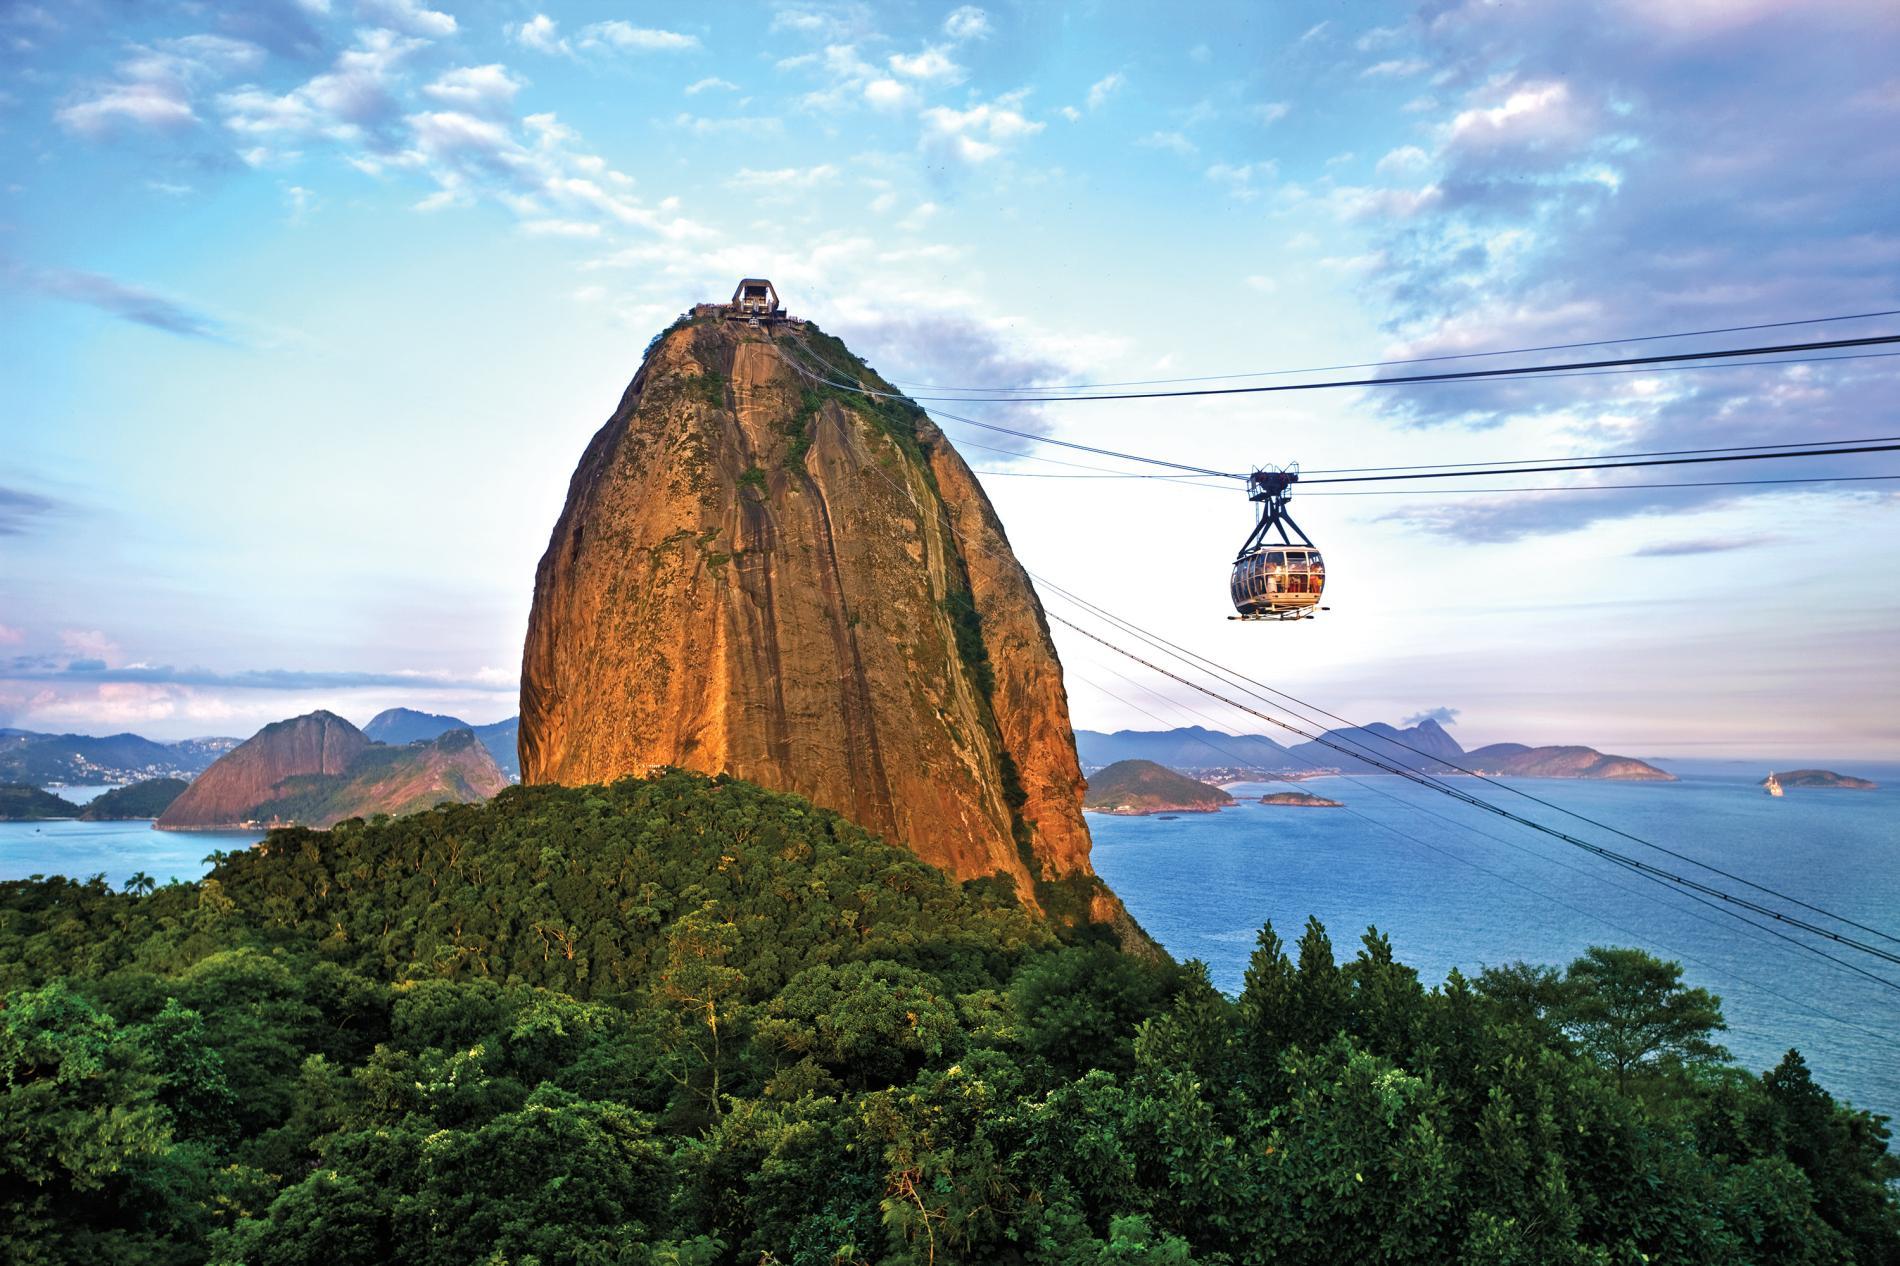 16_cable-car-sugarloaf-mountain-rio-de-janeiro-brazil_adapt_1900_1.jpg